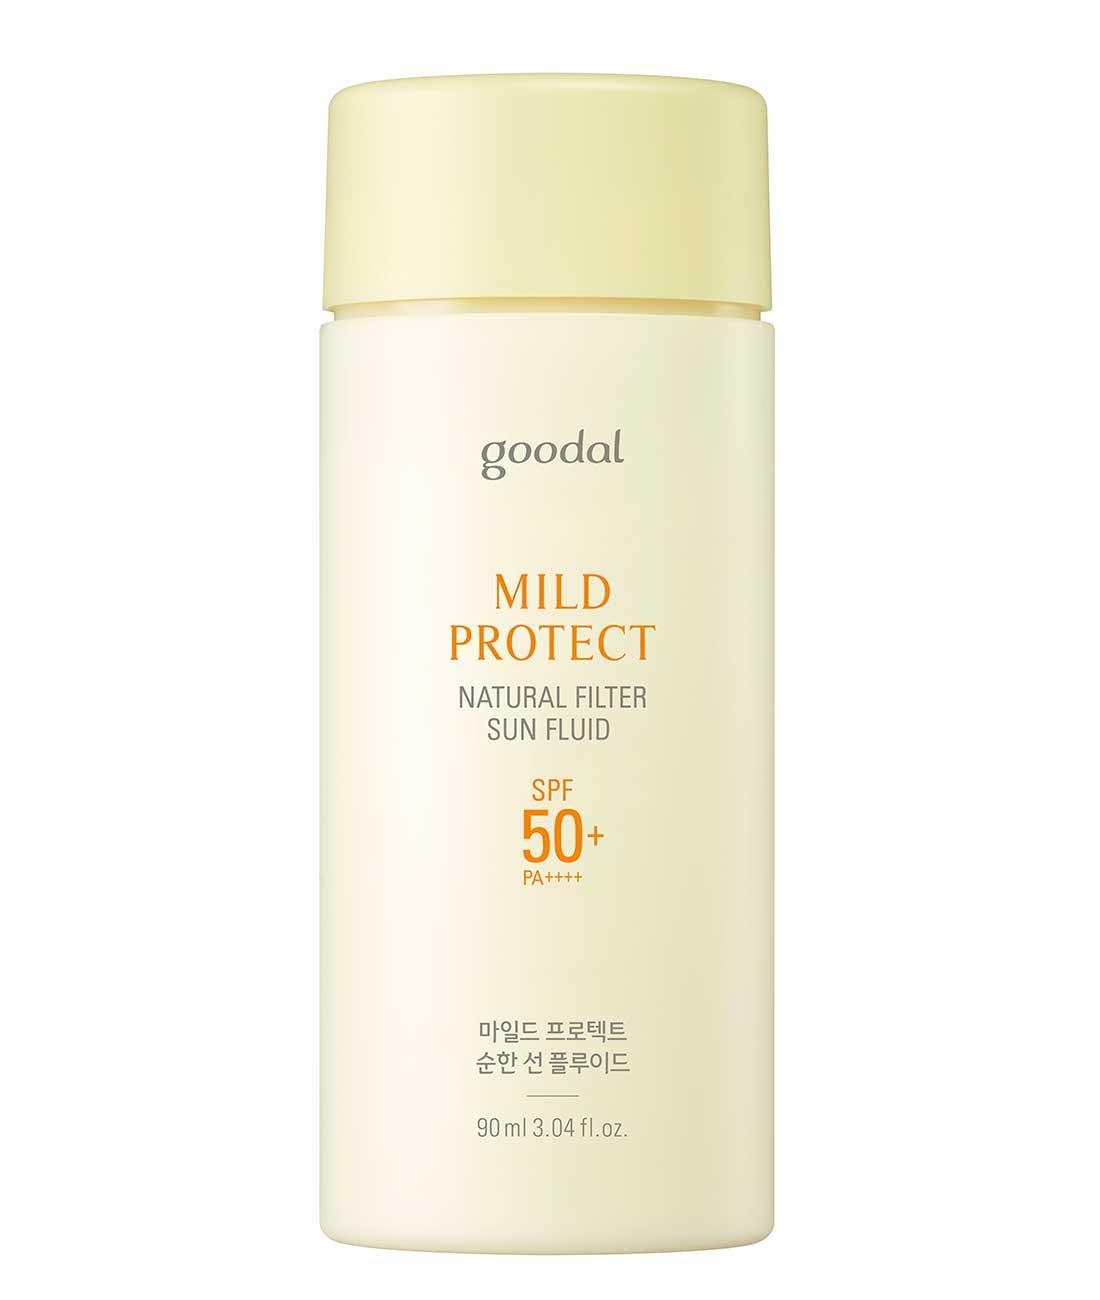 Goodal Mild Protect Natural Filter Sun Fluid 3.04 fl.oz.